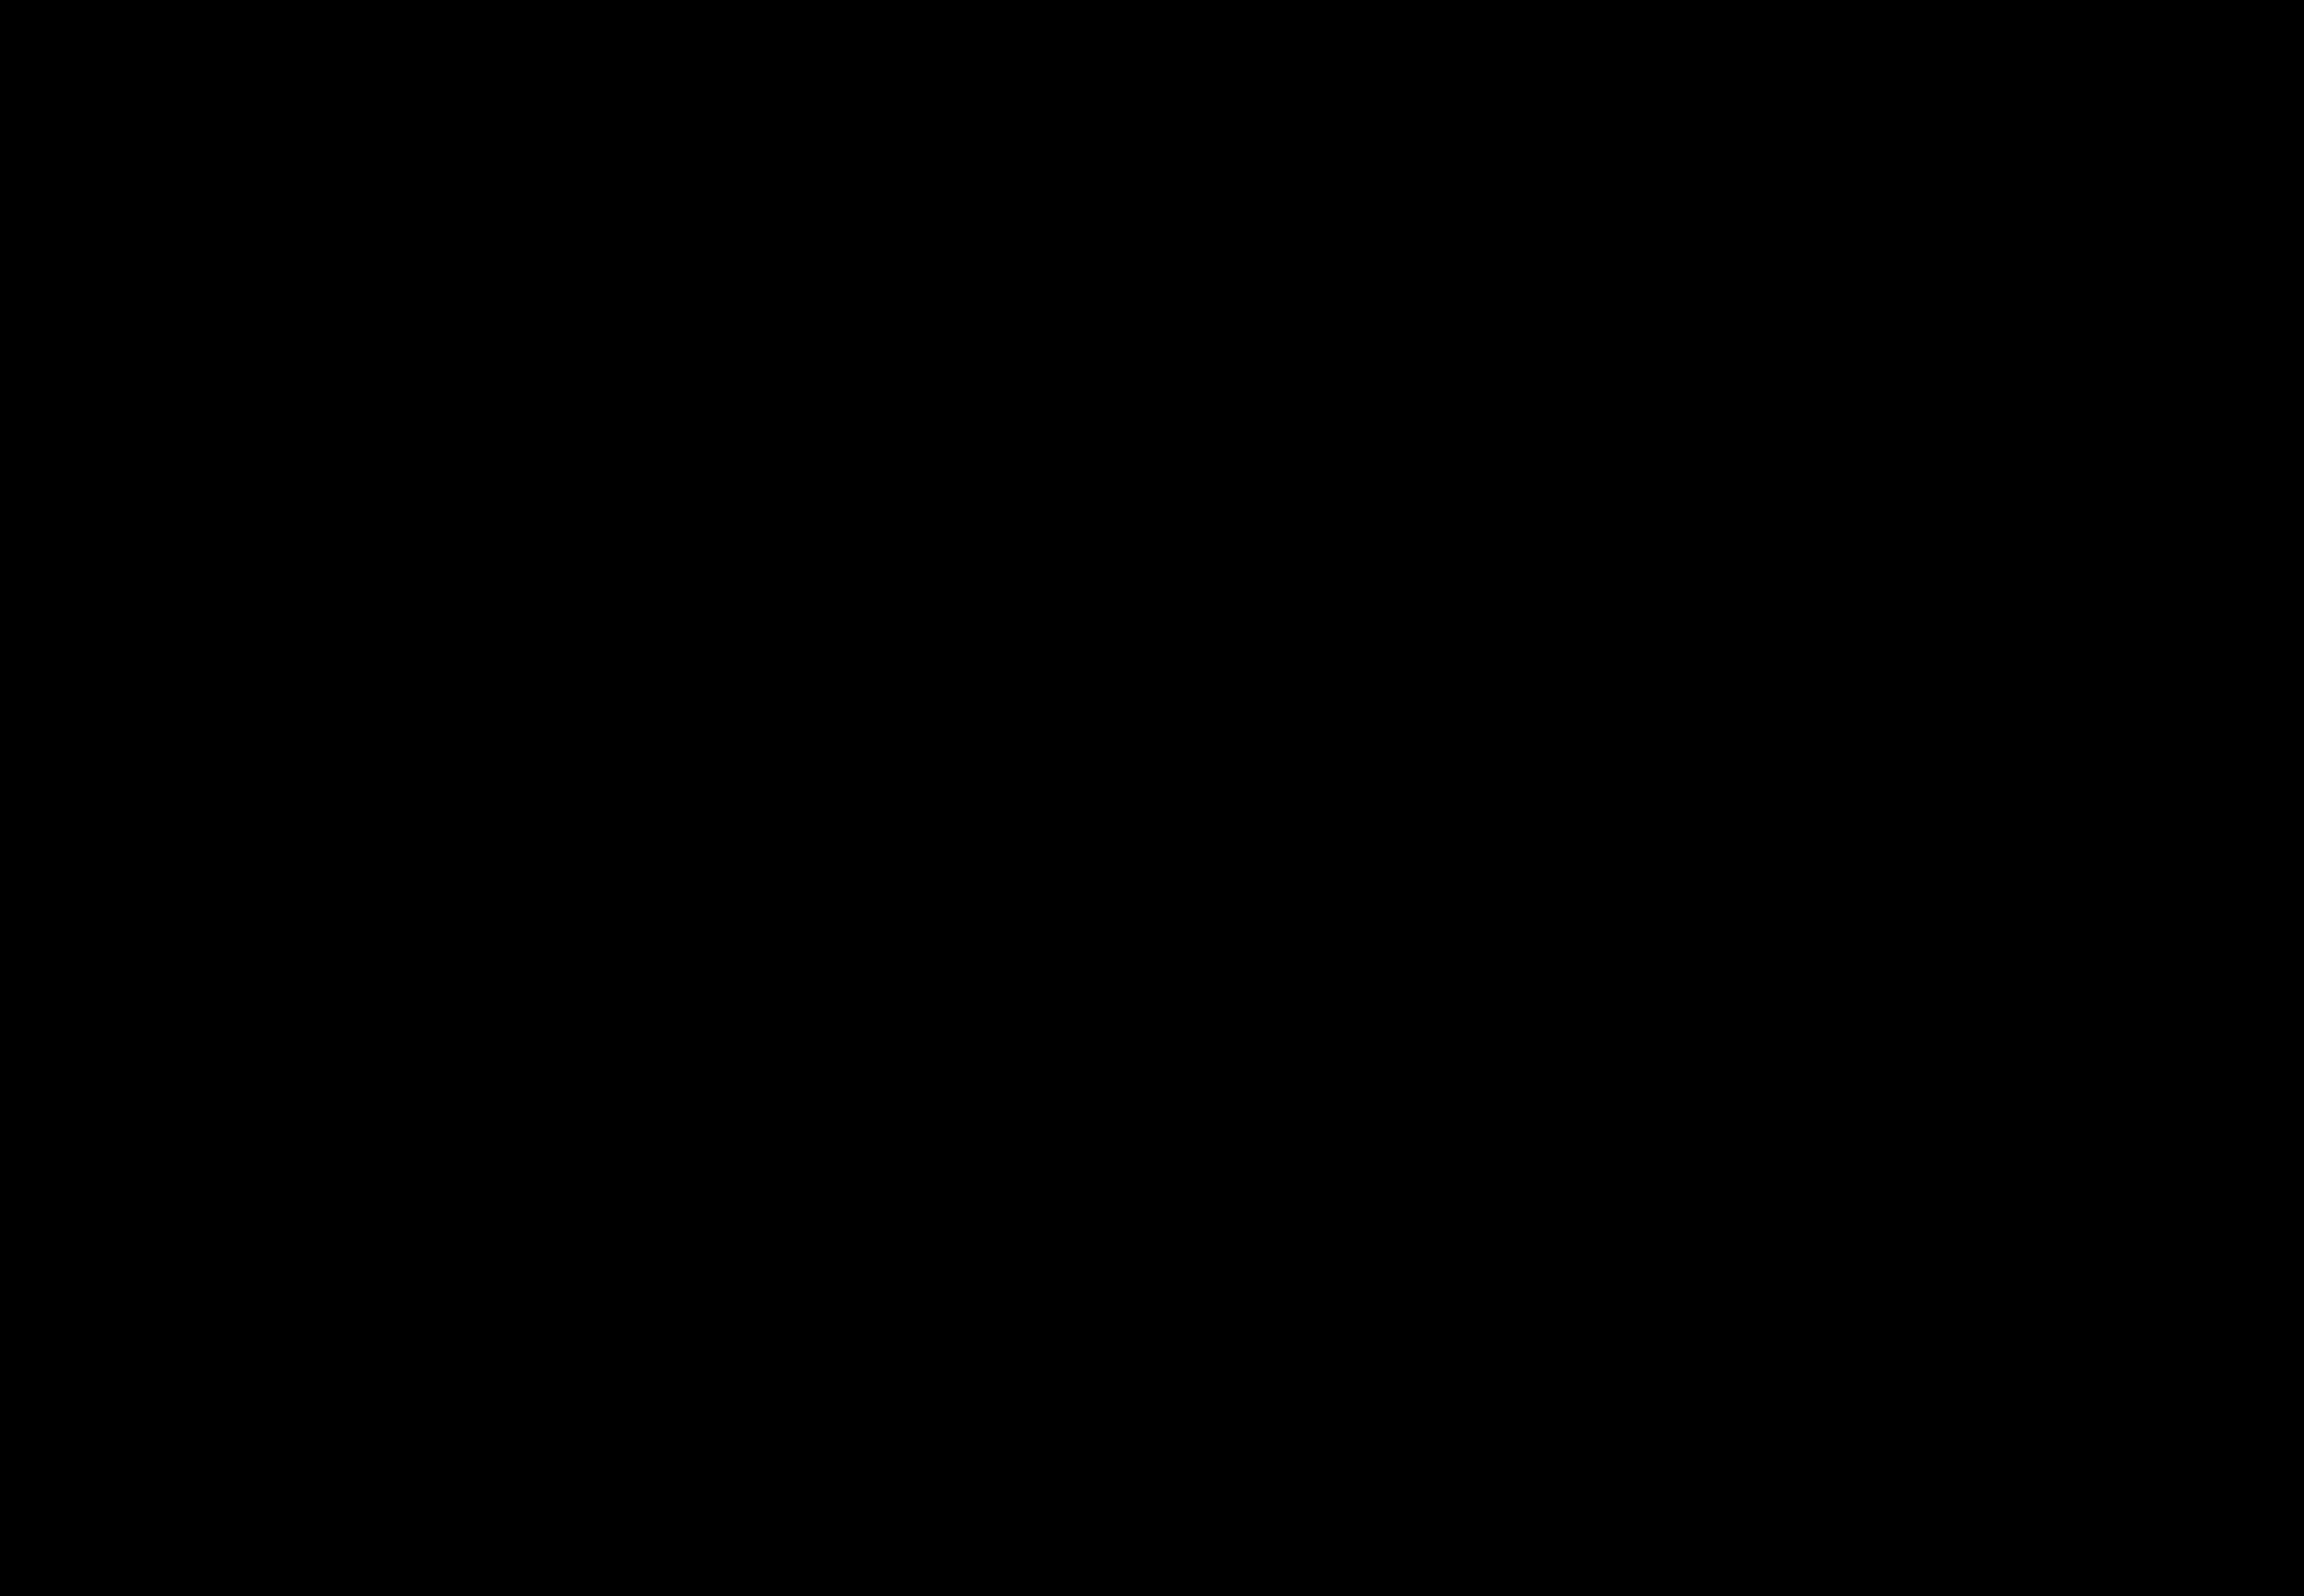 Geometric box frame or. Clipart border simple